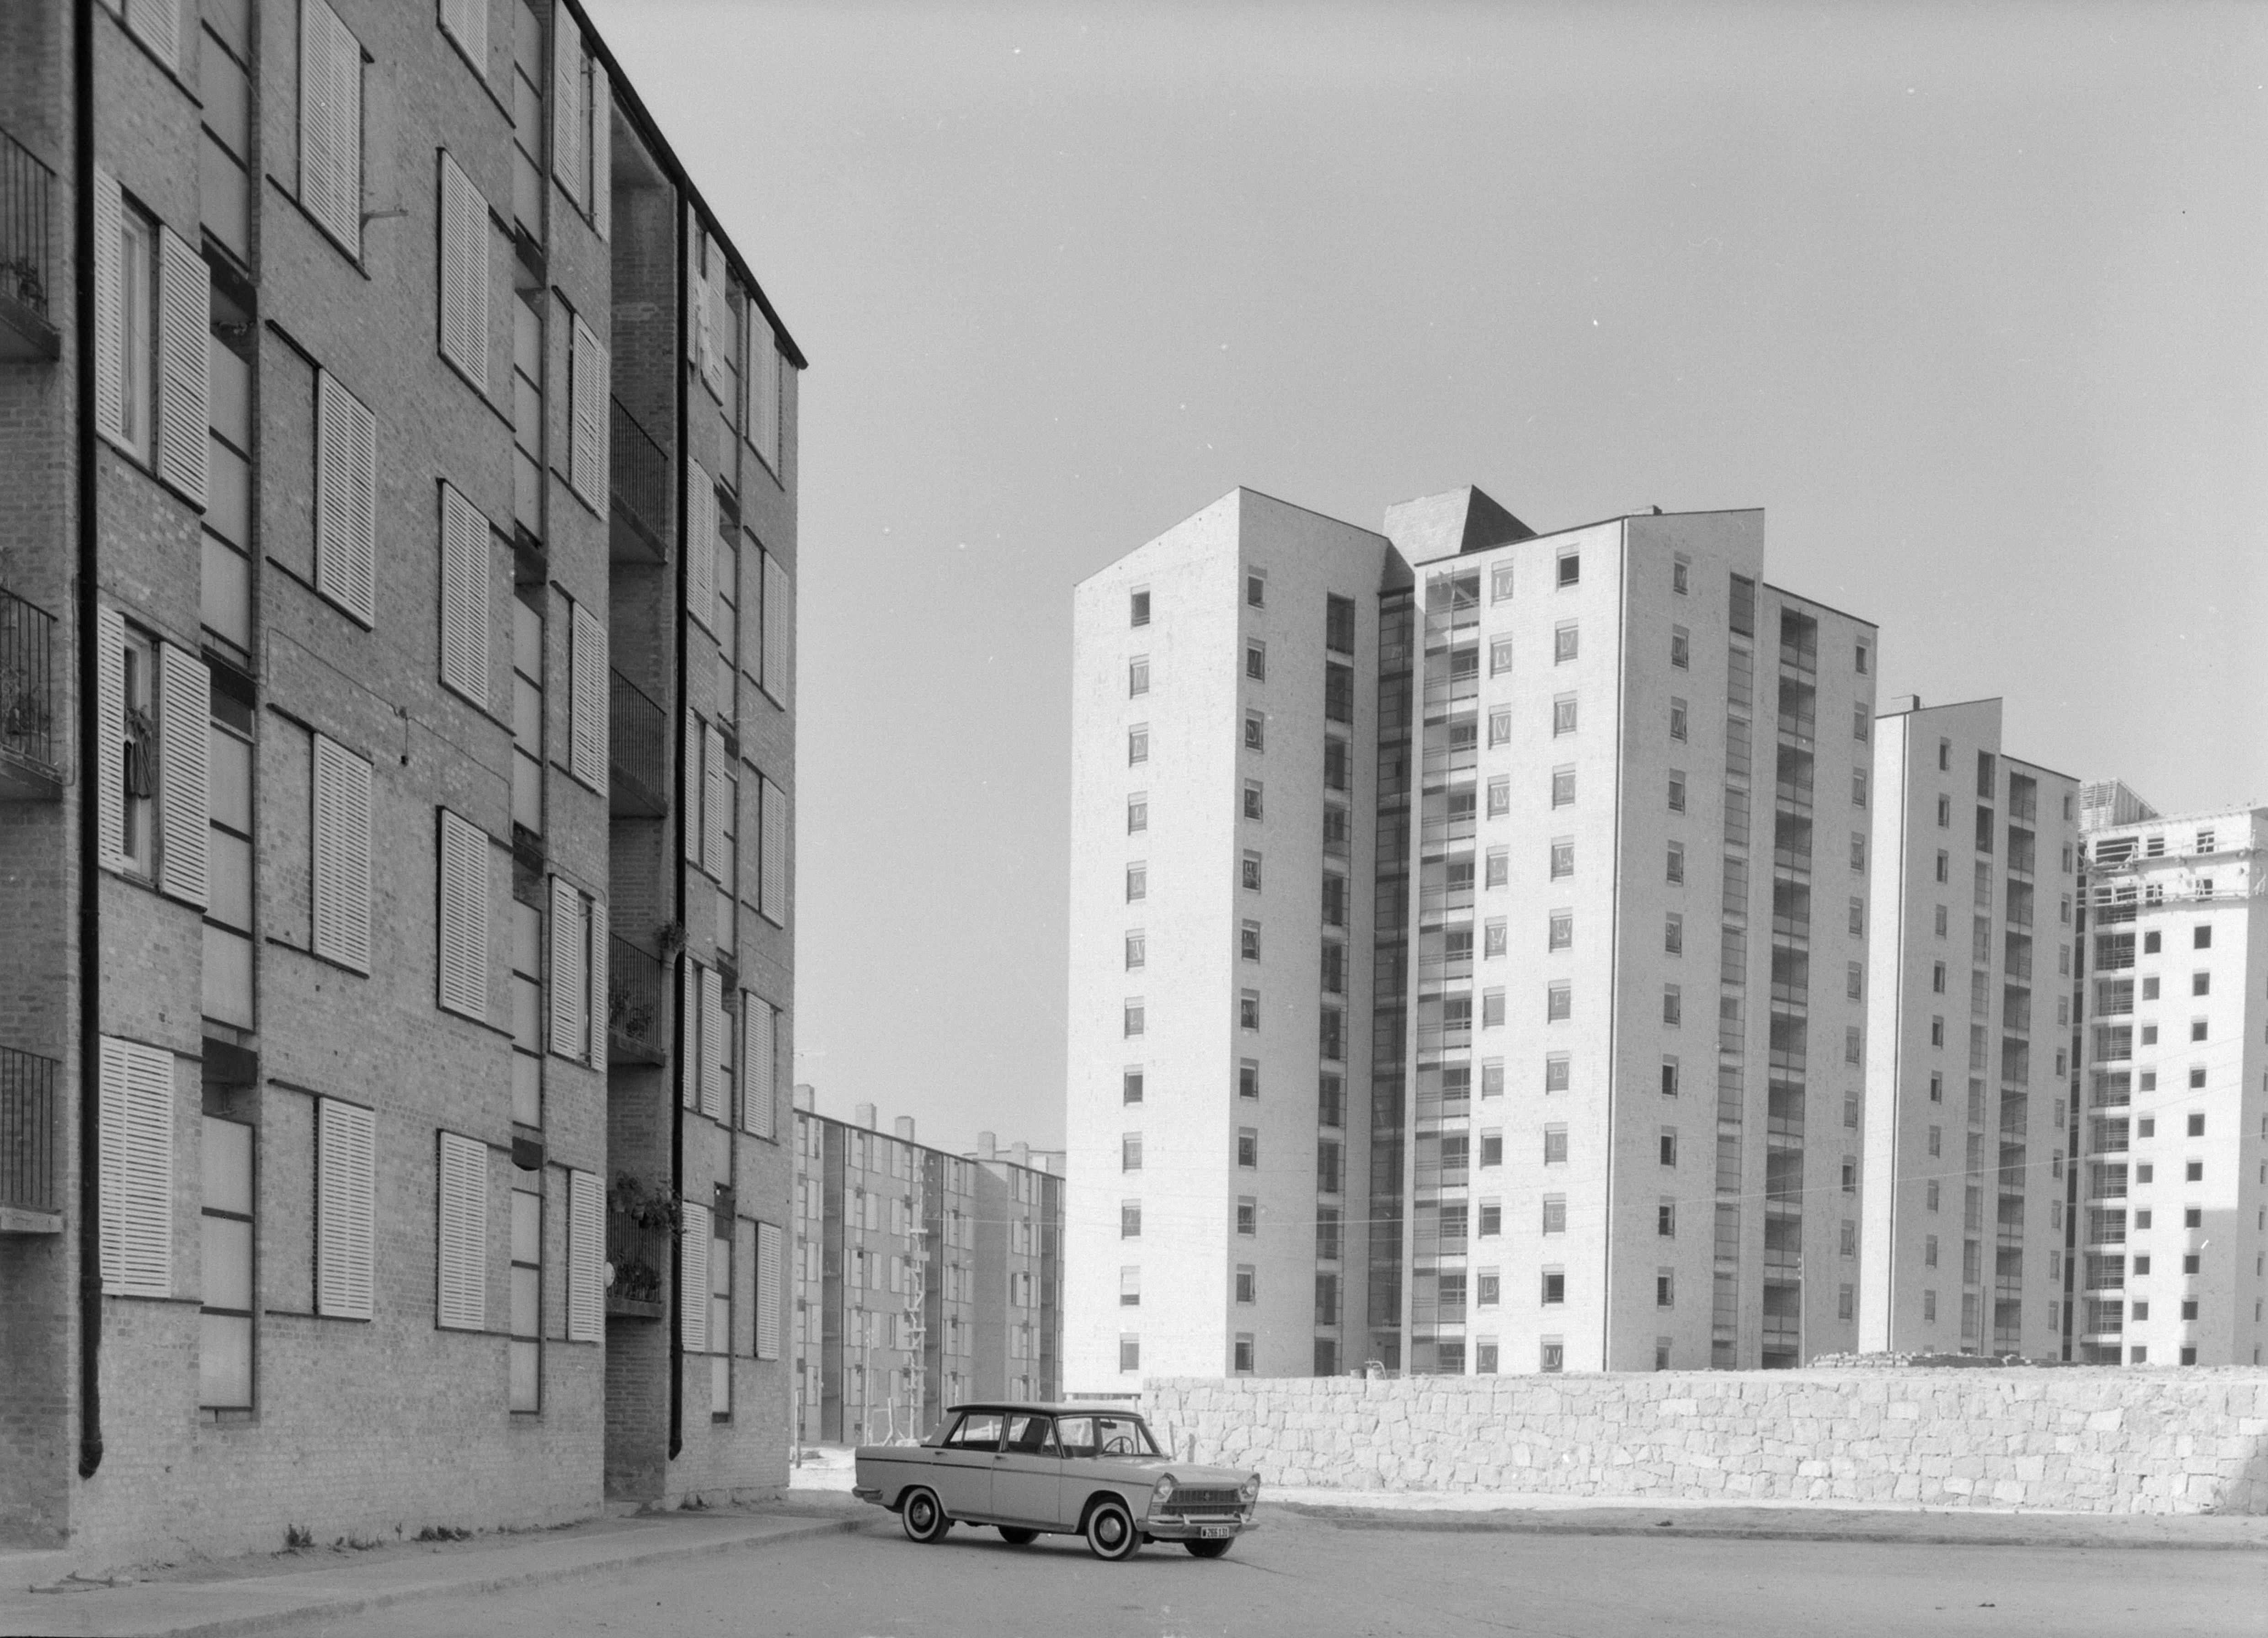 Fotograf a y arquitectura moderna en espa a entrevista a - Arquitectos en espana ...